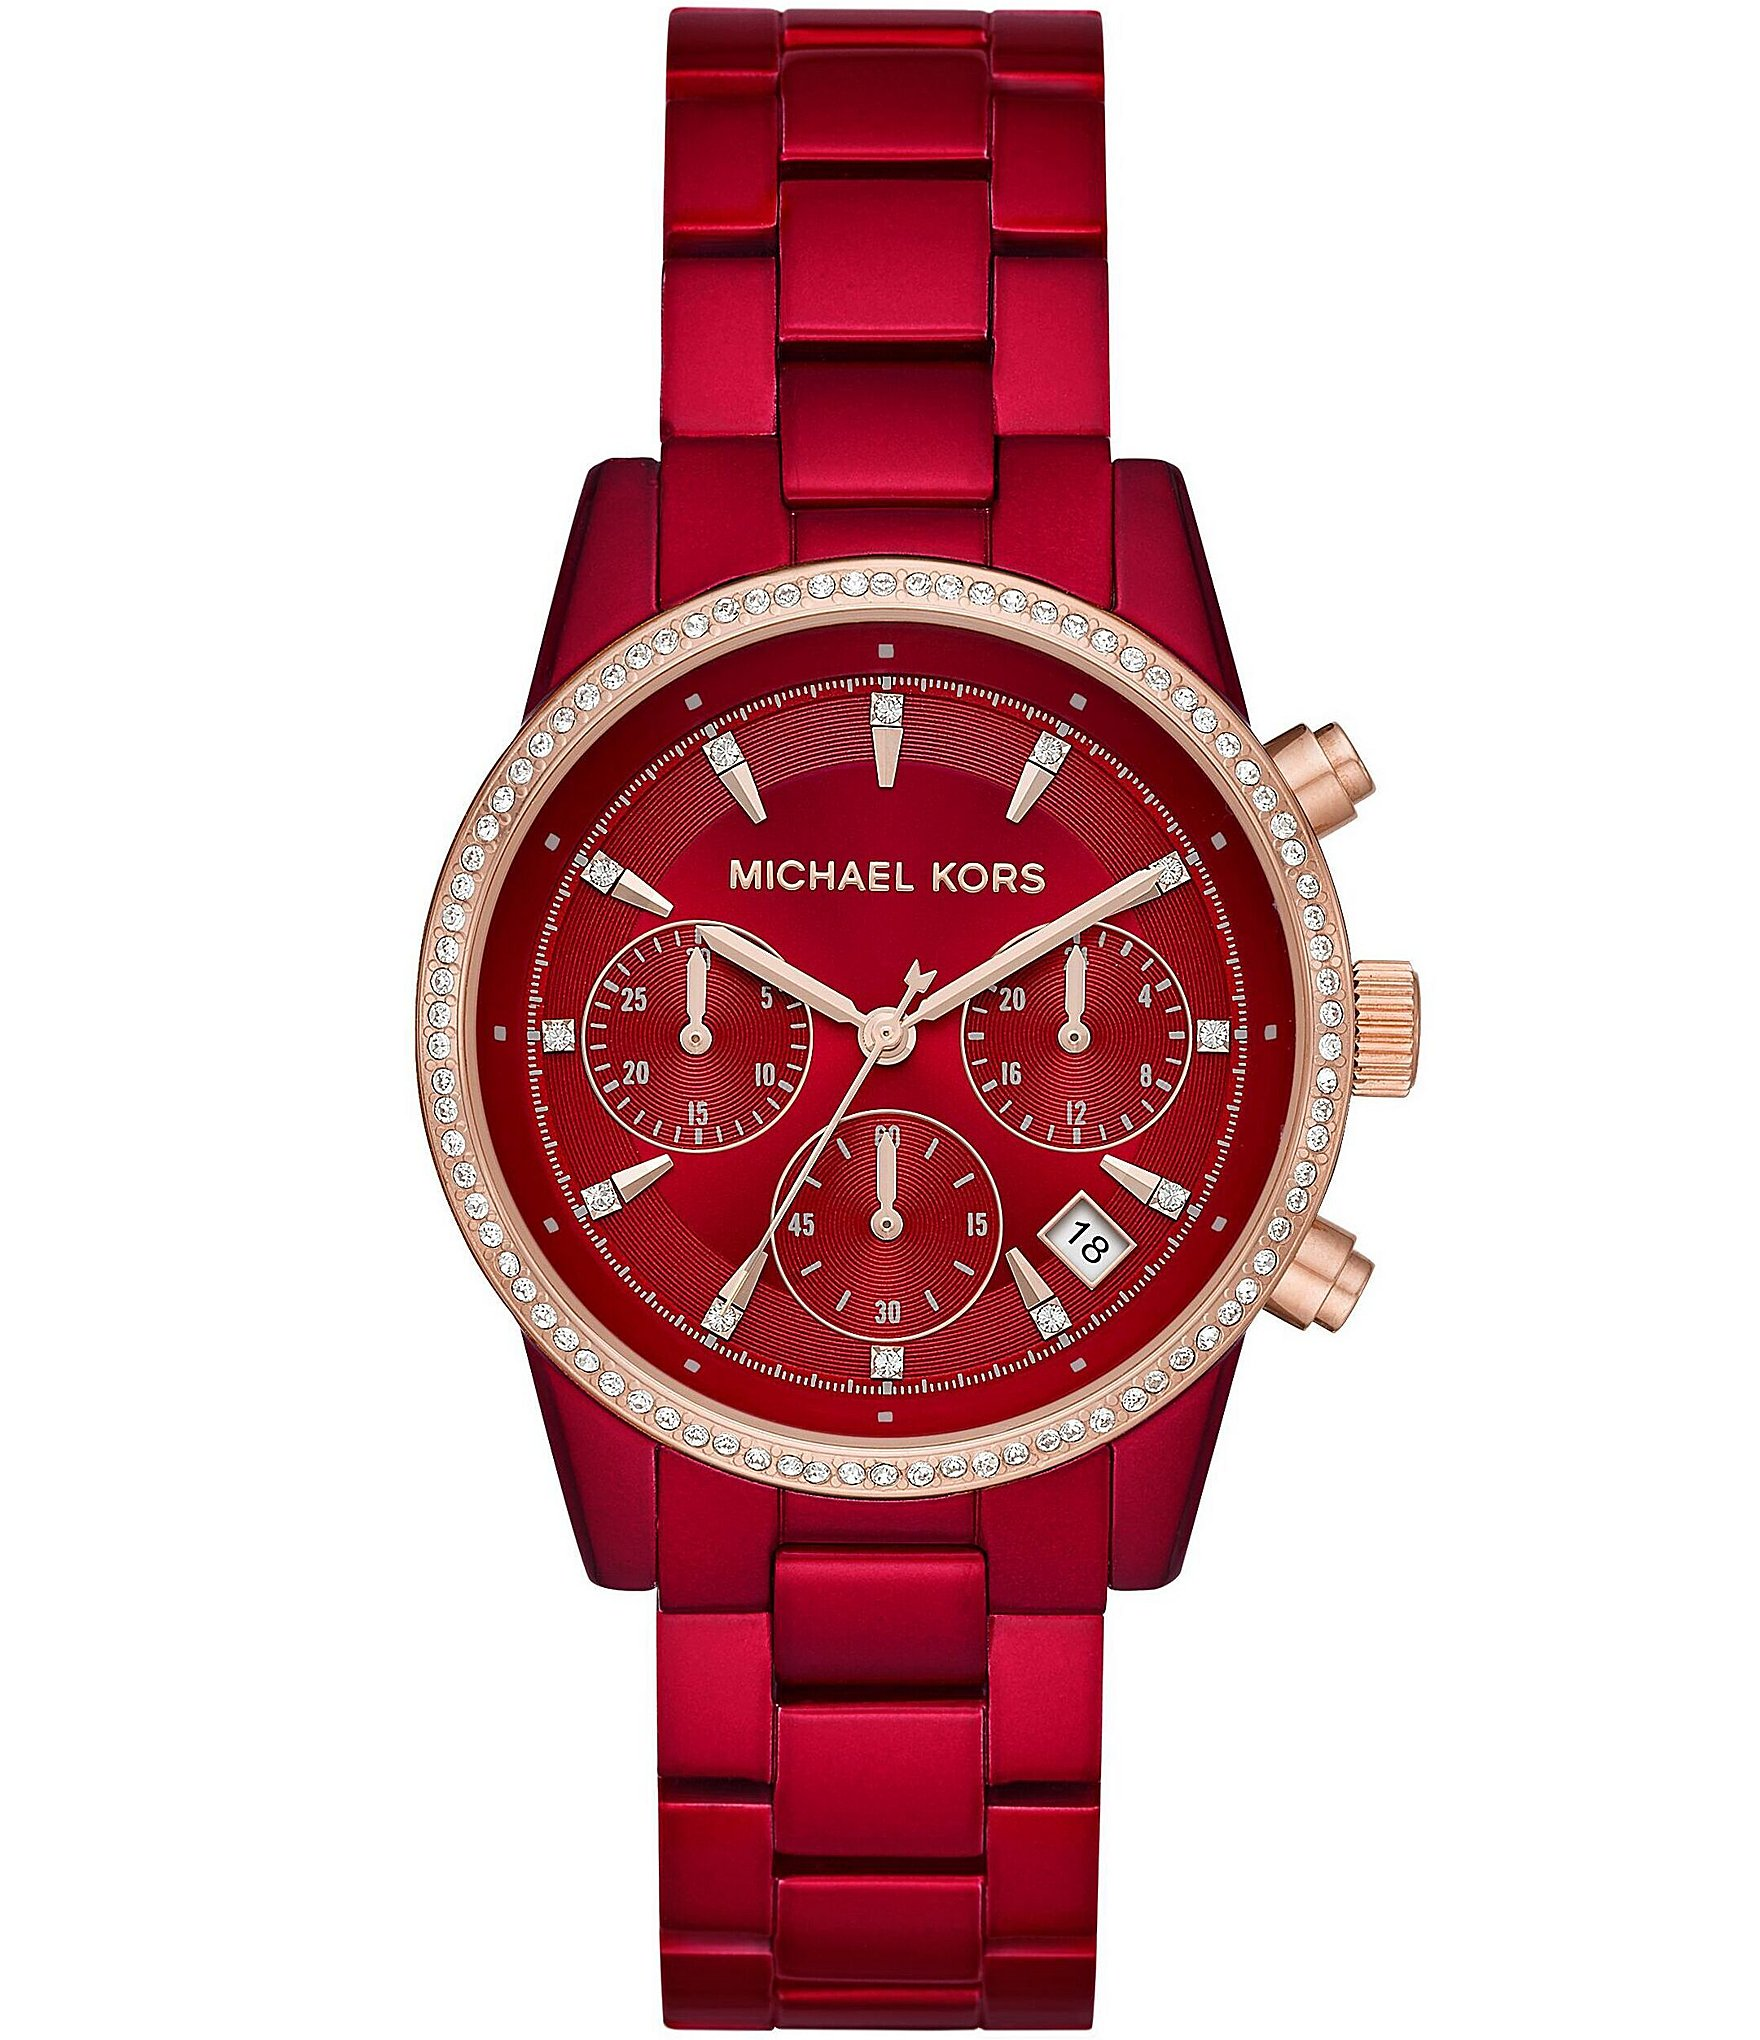 michael kors women: Watches for Men & Women | Dillard's